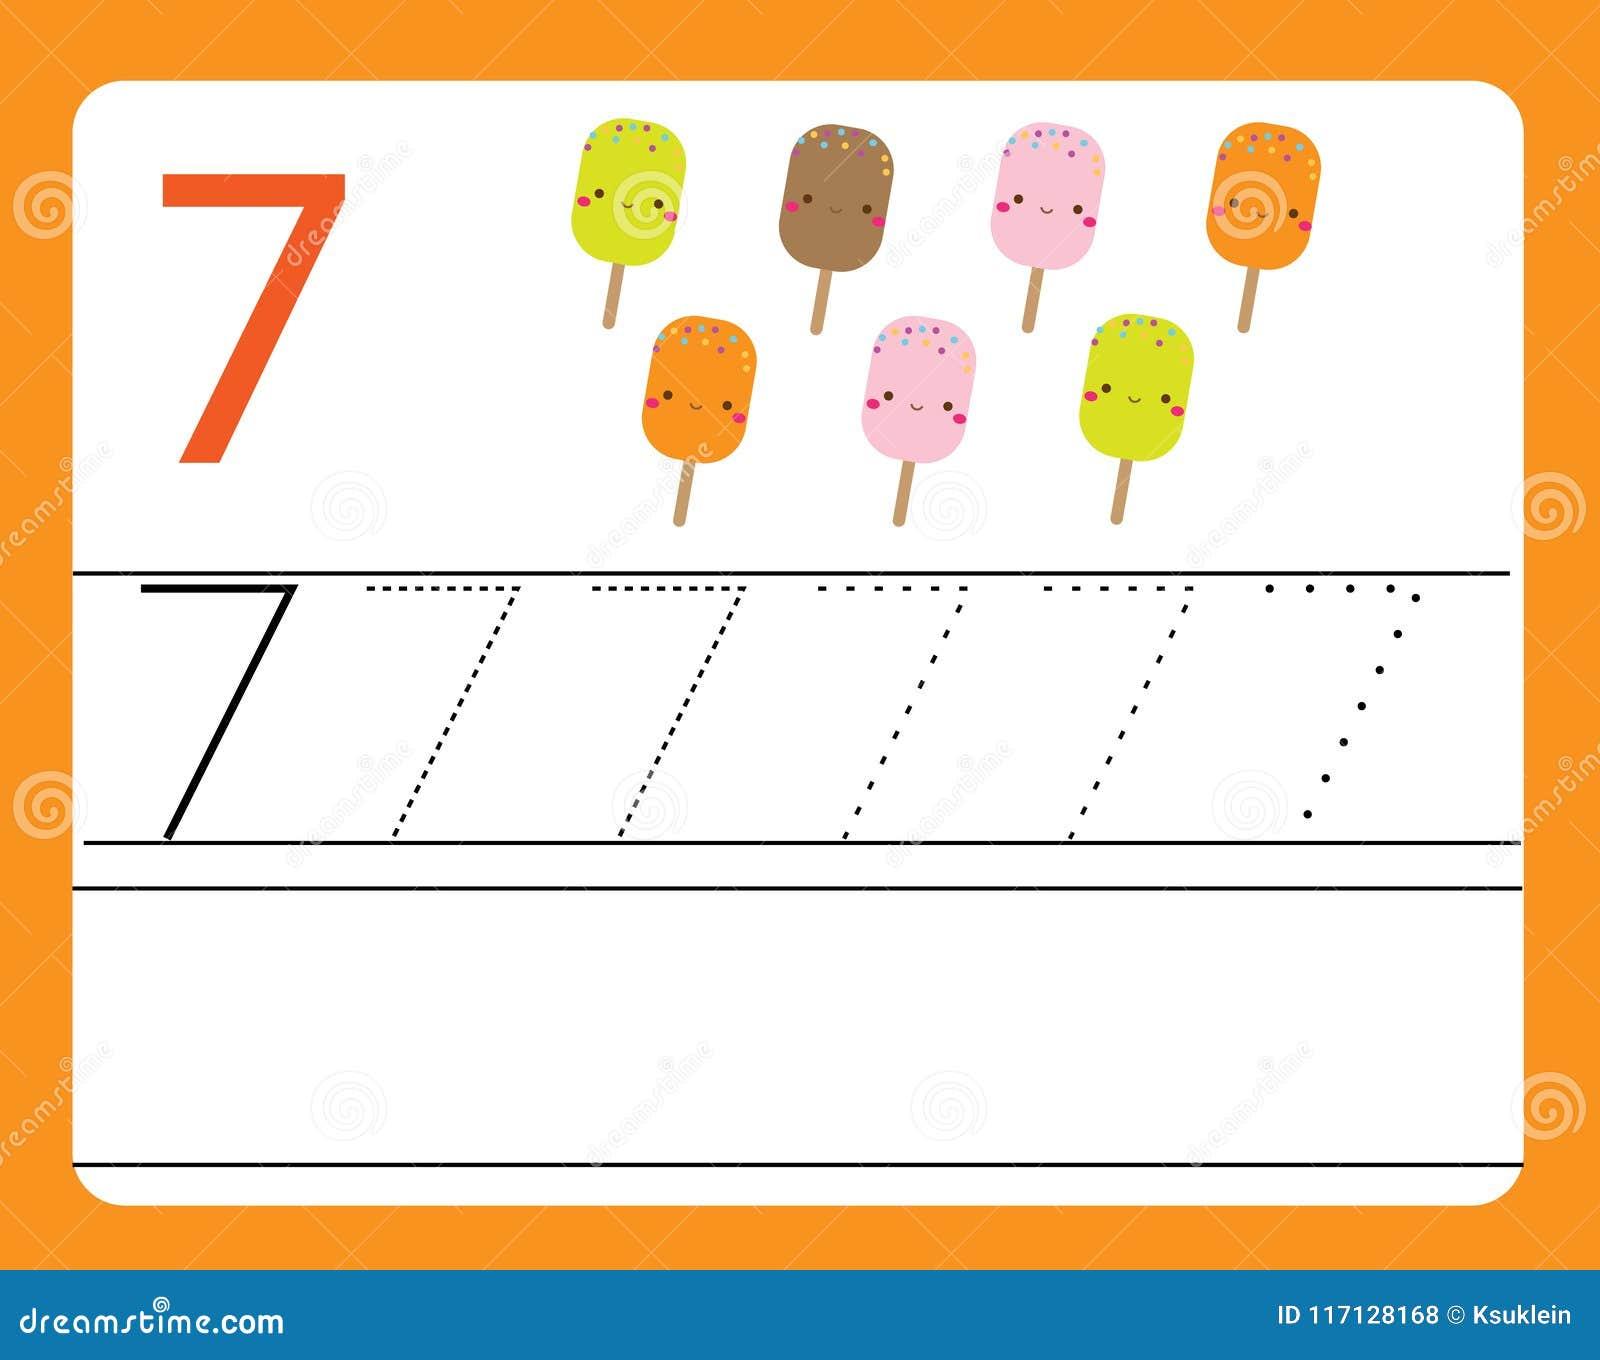 Handwriting practice learning numbers with cute characters number handwriting practice learning numbers with cute characters number seven educational printable worksheet for ibookread PDF